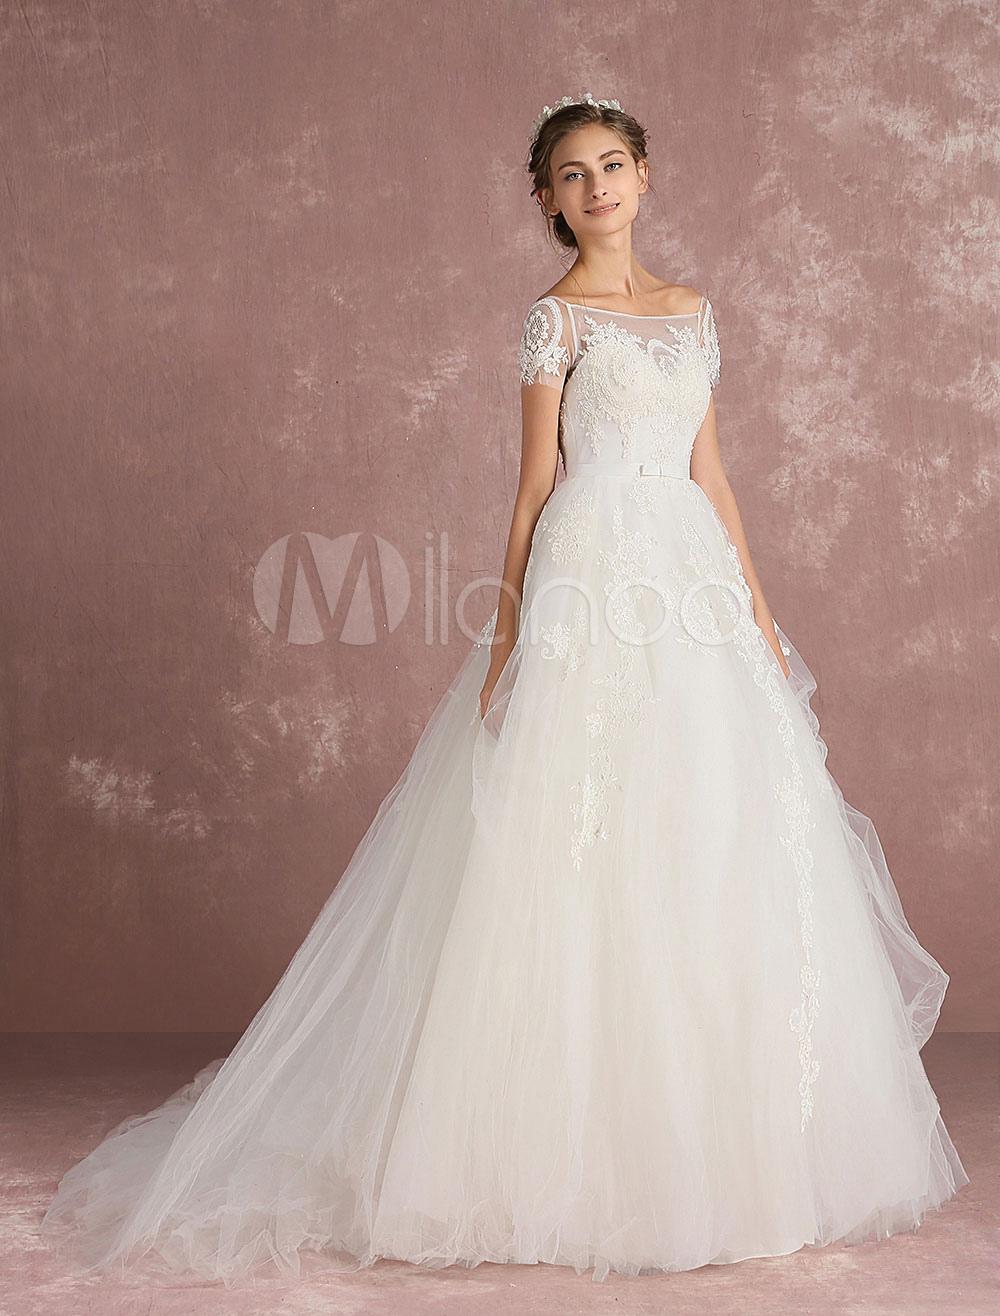 6ea7024a53c Tulle Wedding Dress Ivory Bridal Dress Lace Applique Beading Back ...